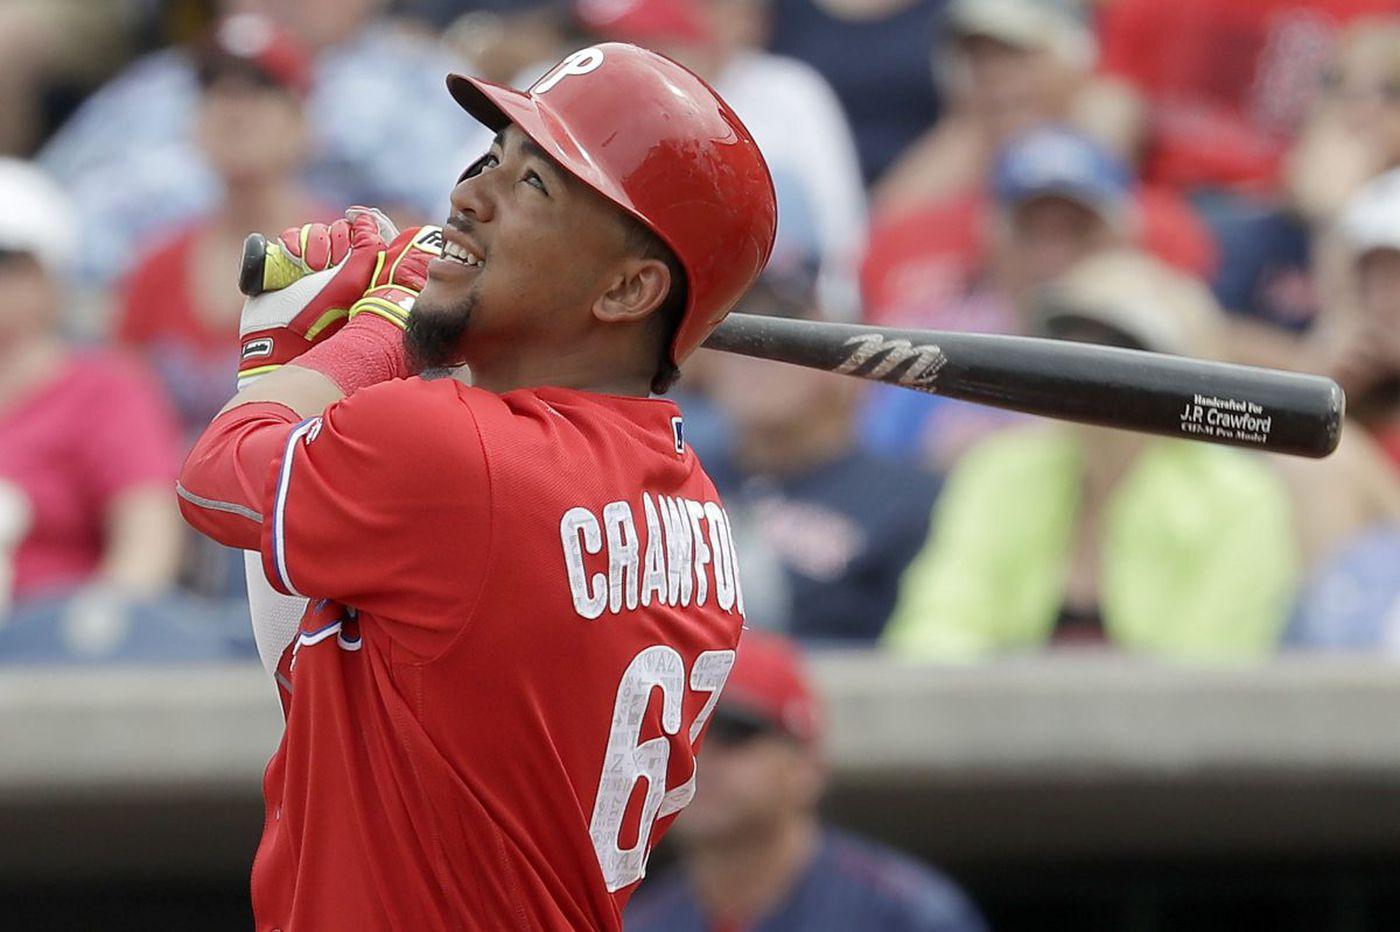 Lehigh Valley's J.P. Crawford swinging blistering bat